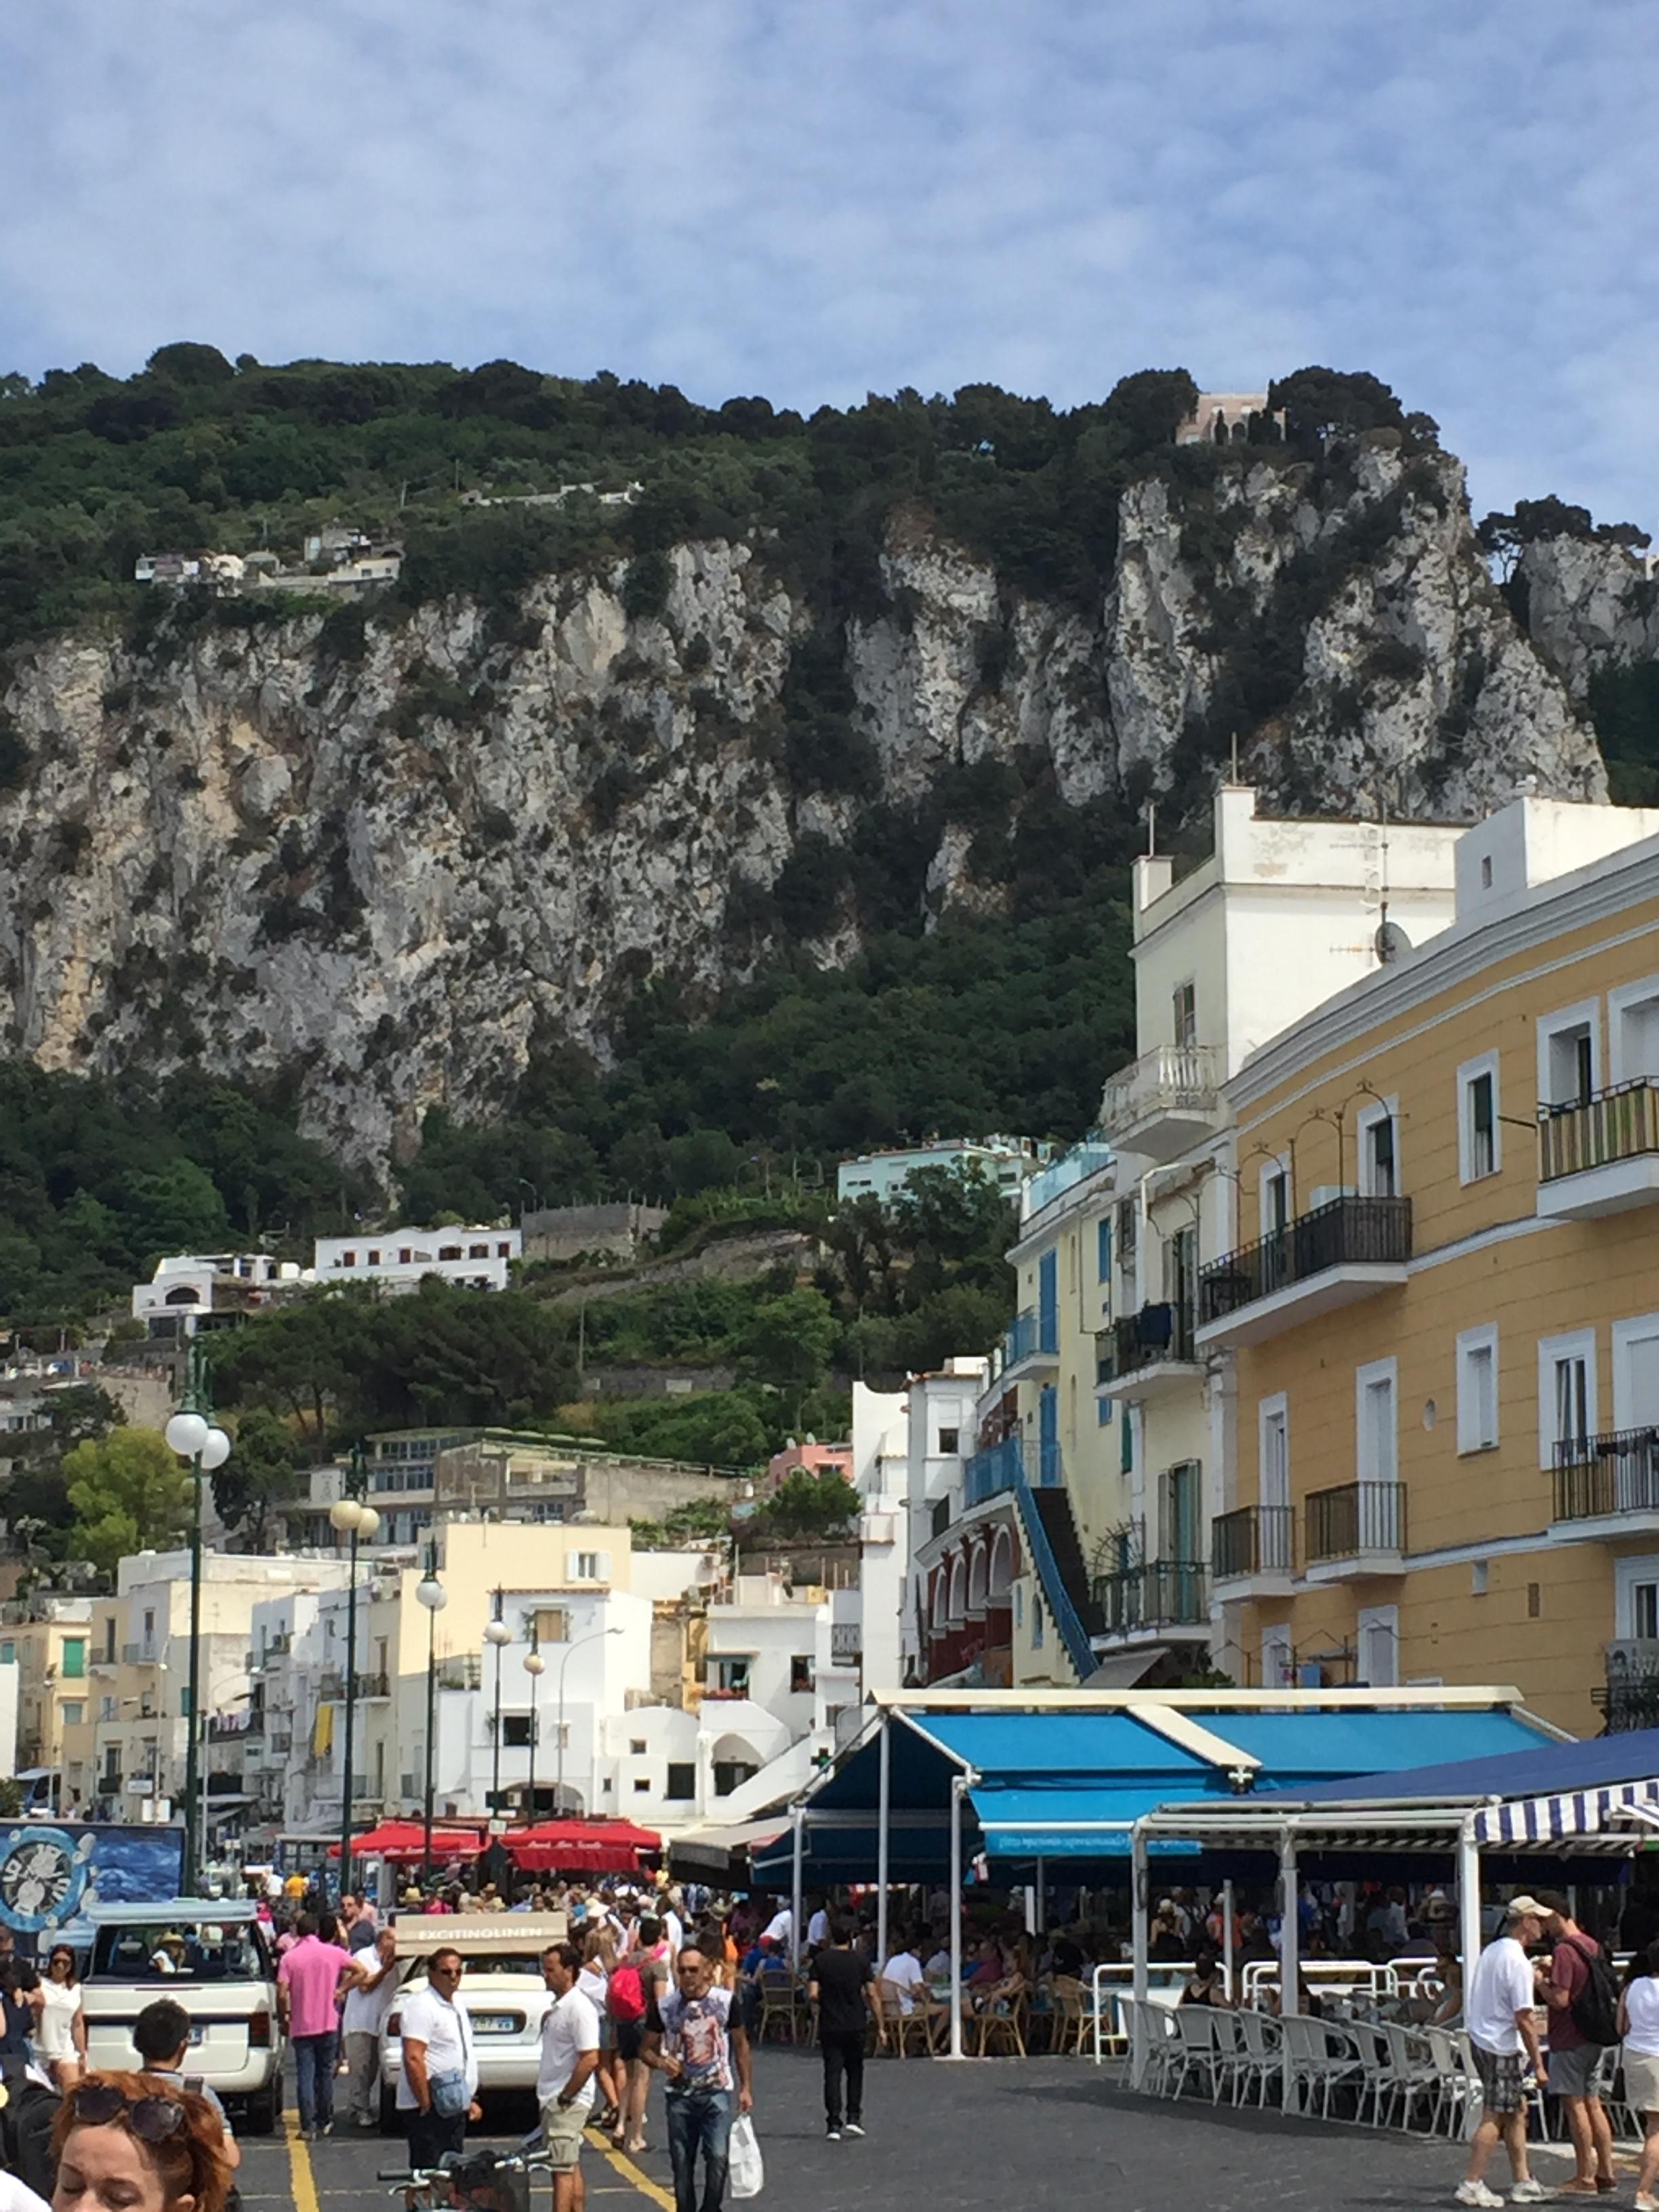 Capri, Italy Main City Square right off the boat